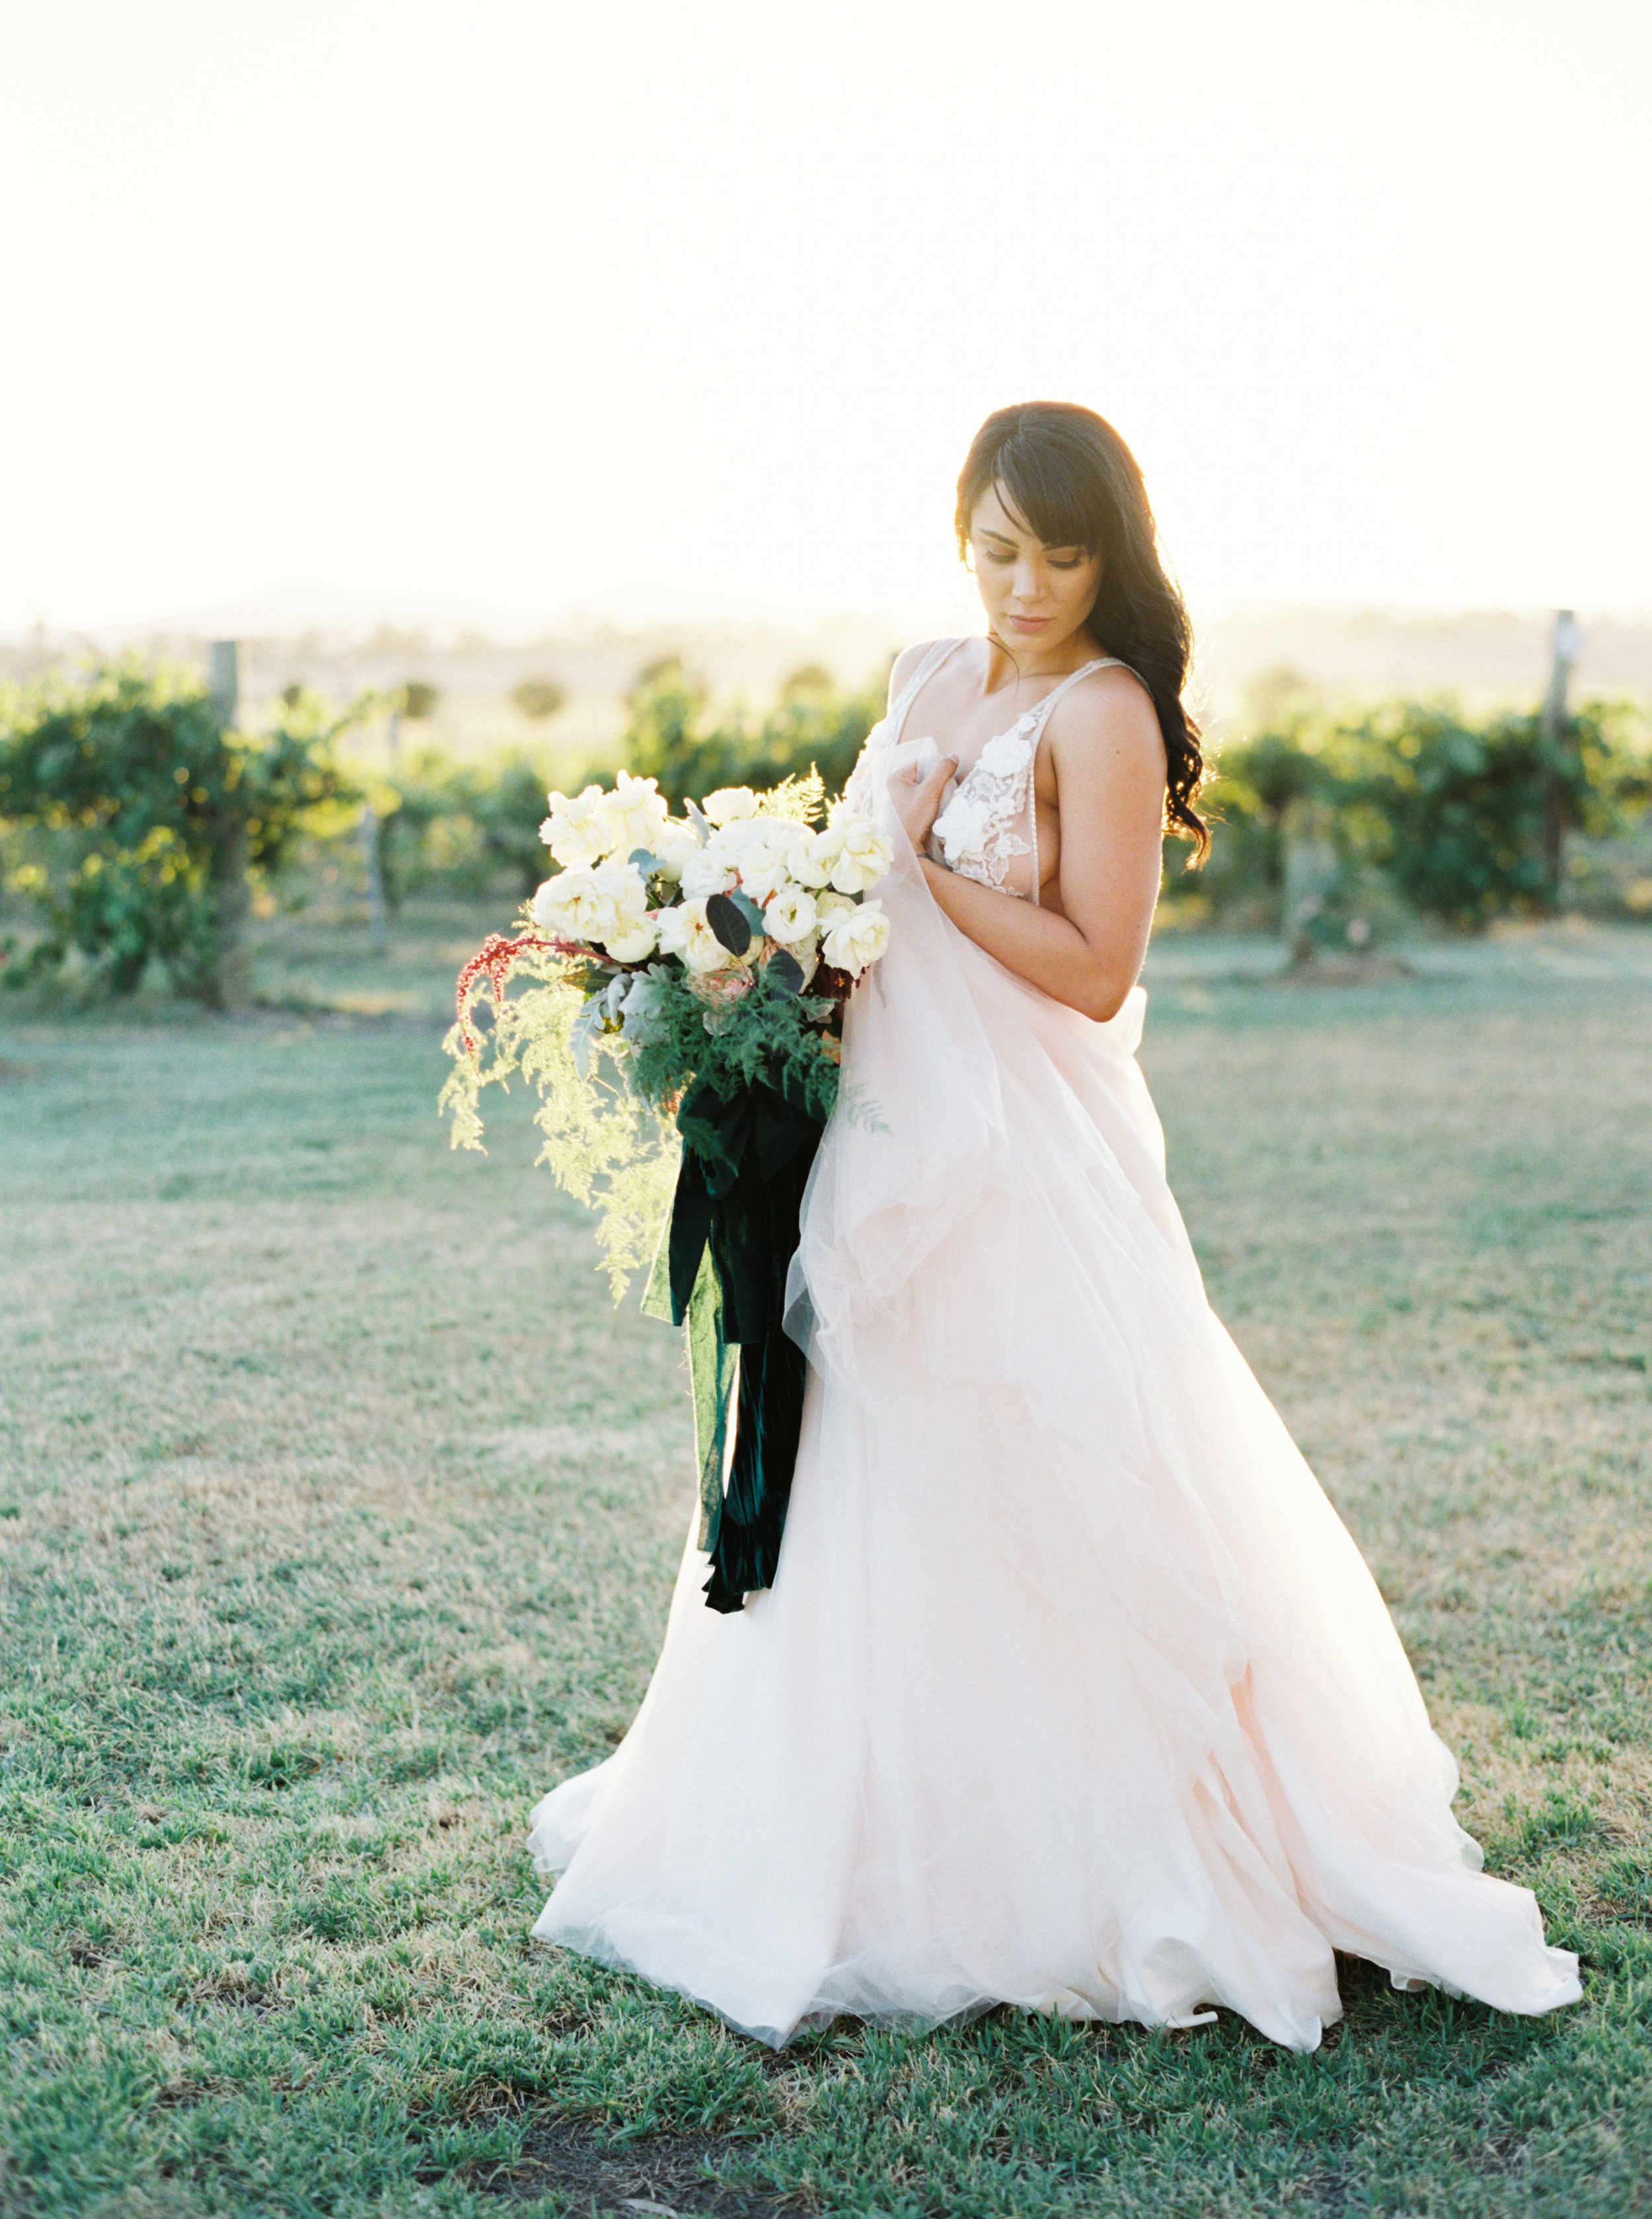 00039- Tamworth NSW Wedding Photographer Sheri McMahon-2.jpg